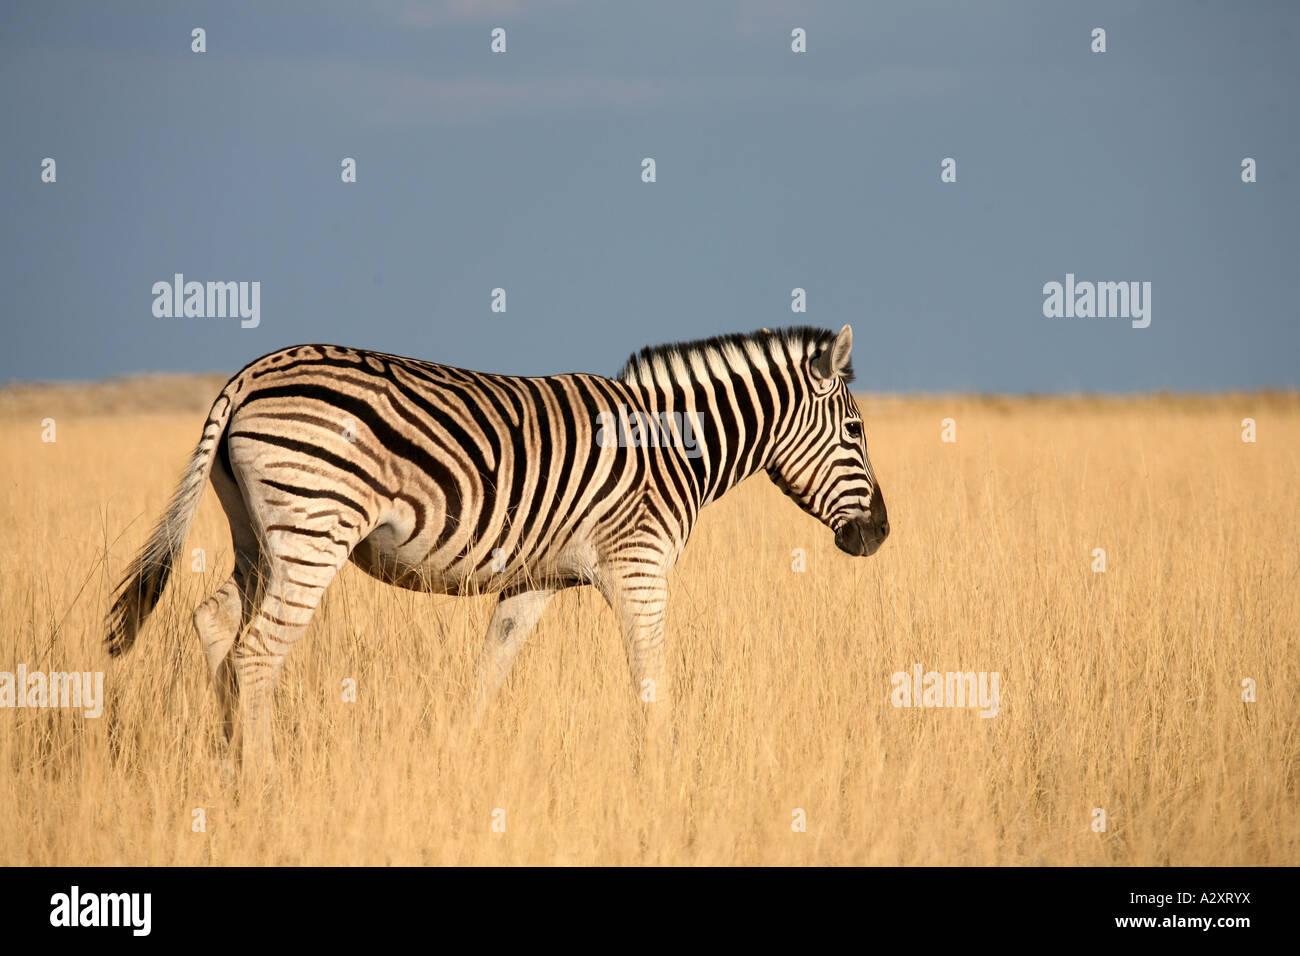 Zebra in dawn light at Etosha National Park Namibia Africa Stock Photo